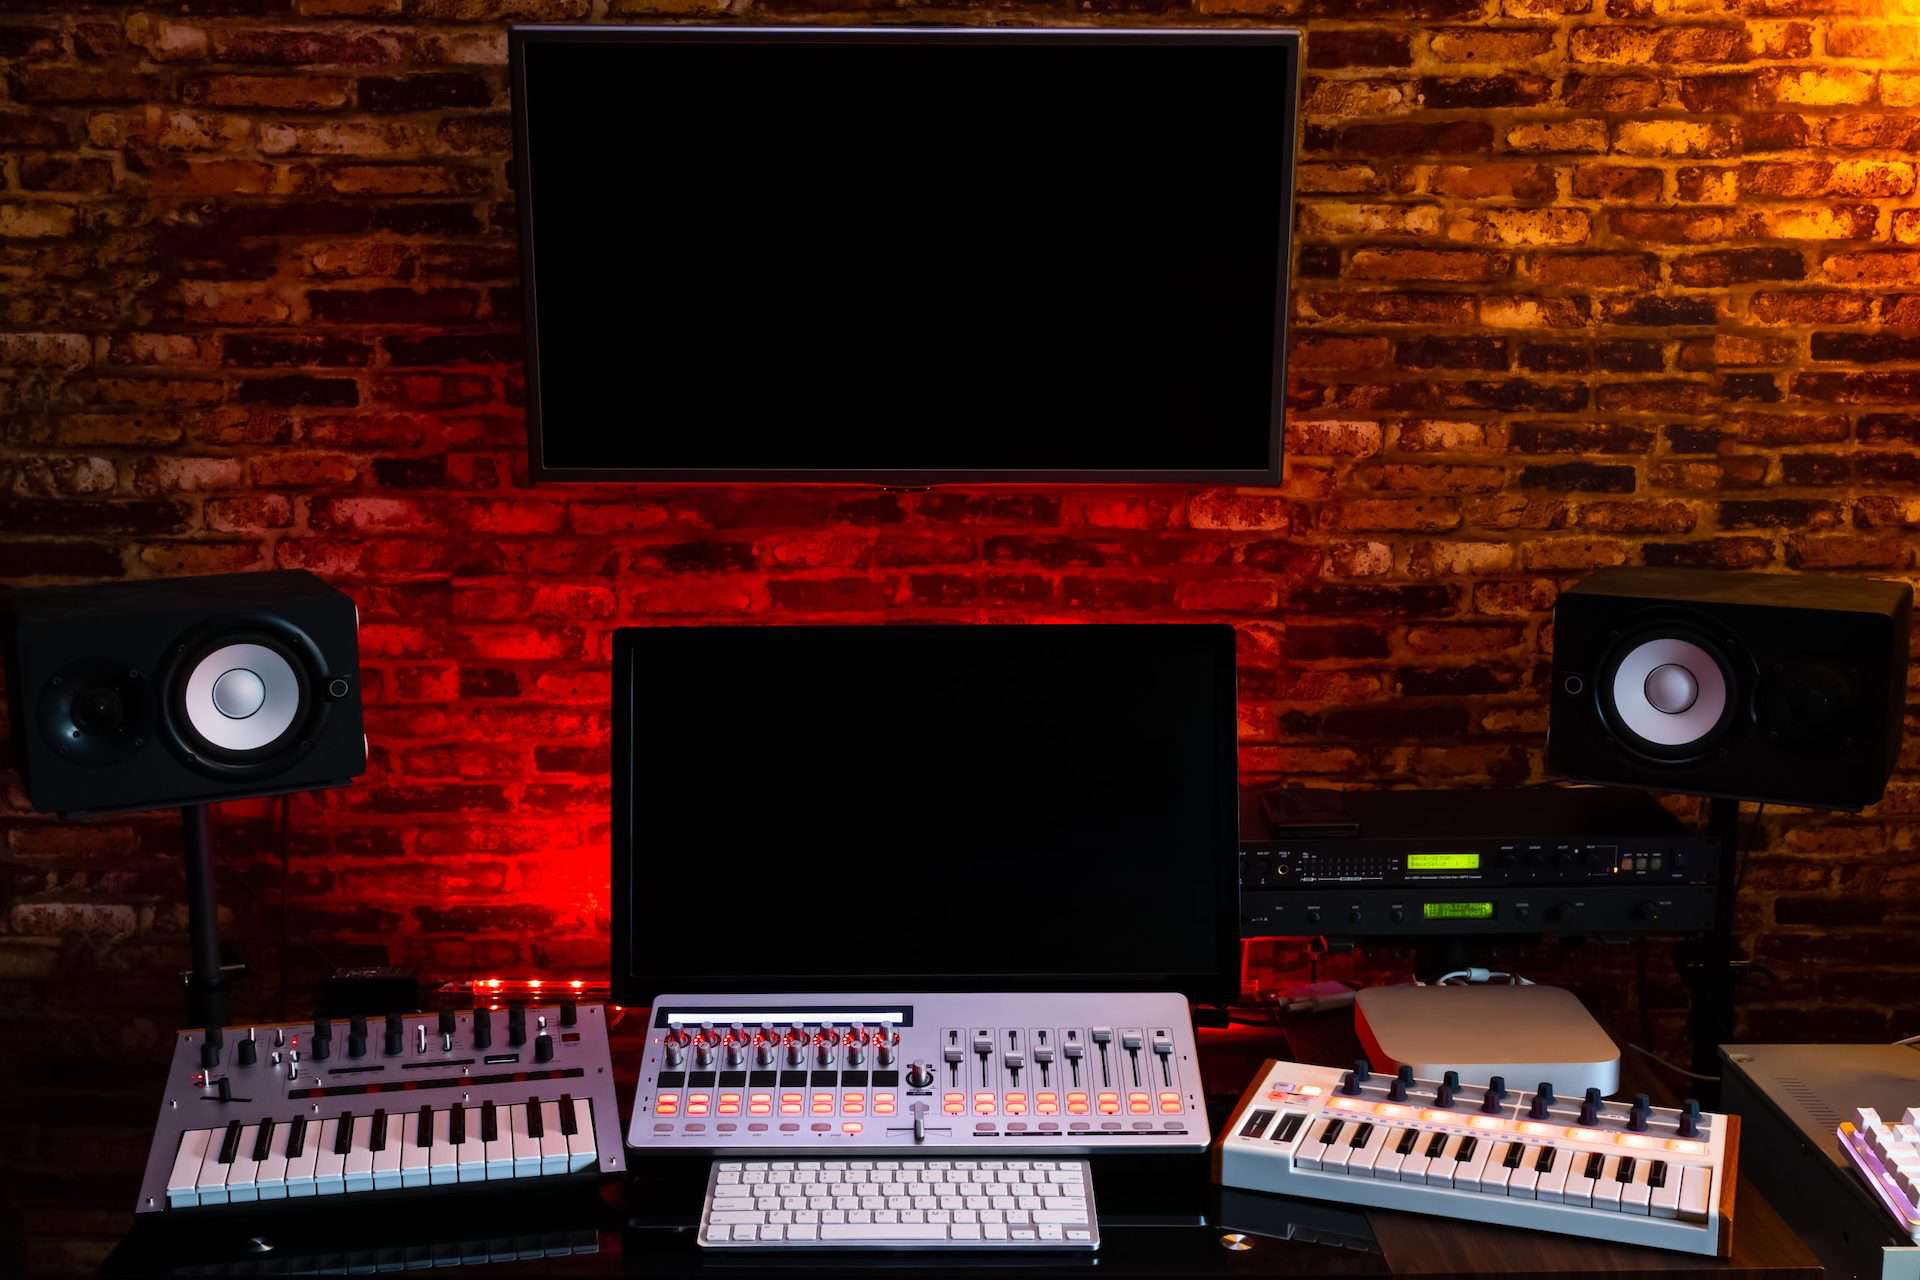 Home Studio vs Professional Studio - Raz Klinghoffer